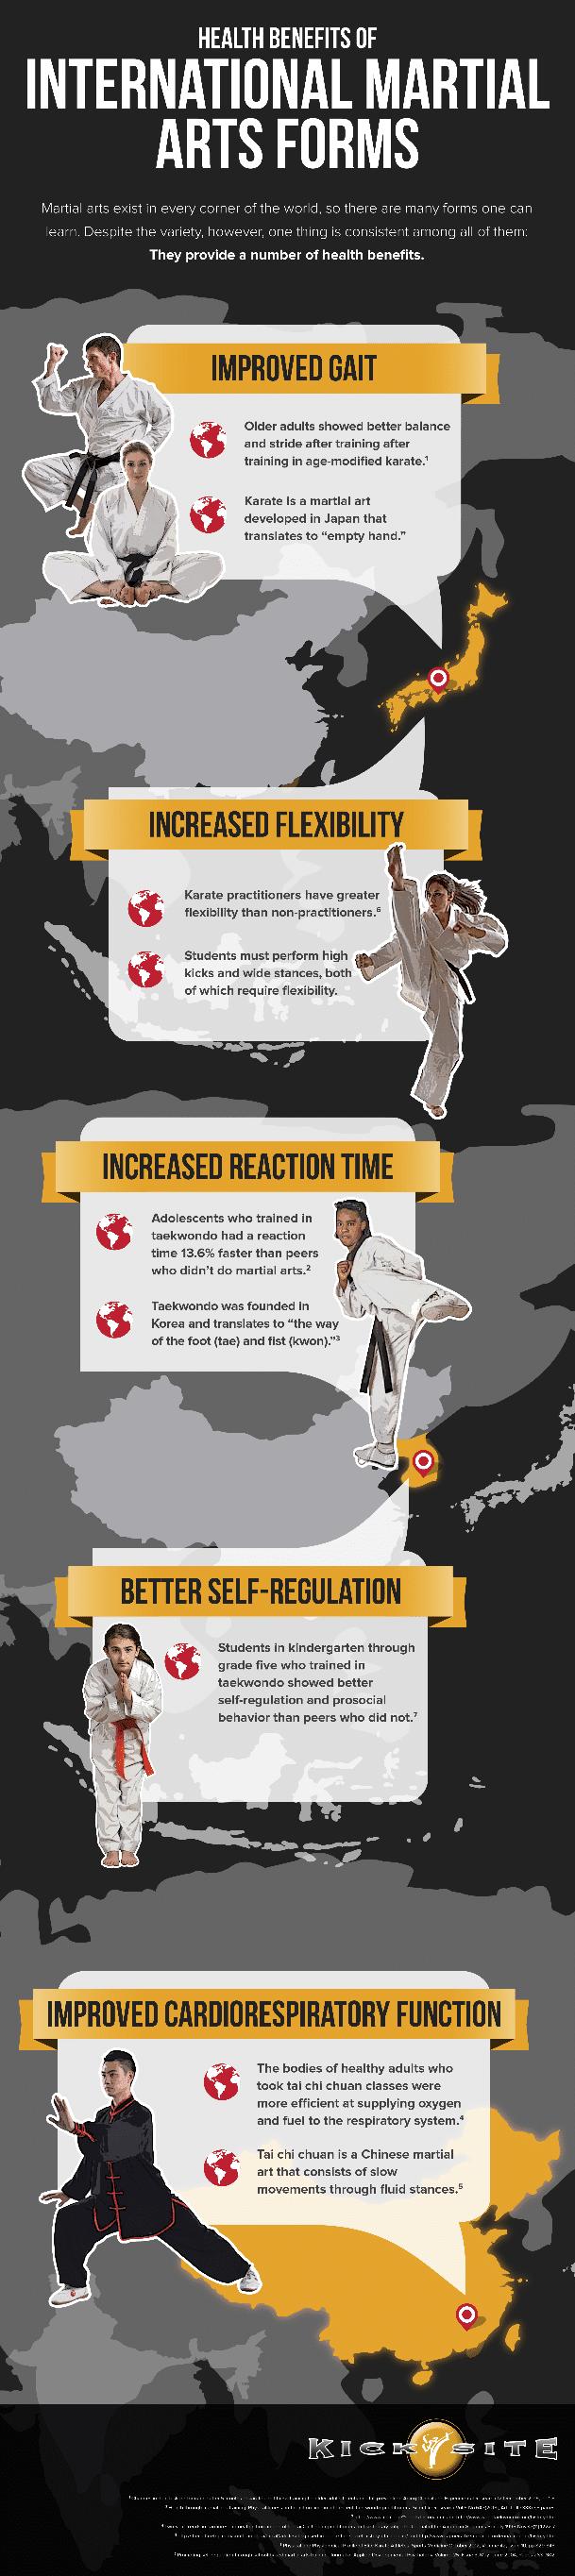 International Martial Arts Forms